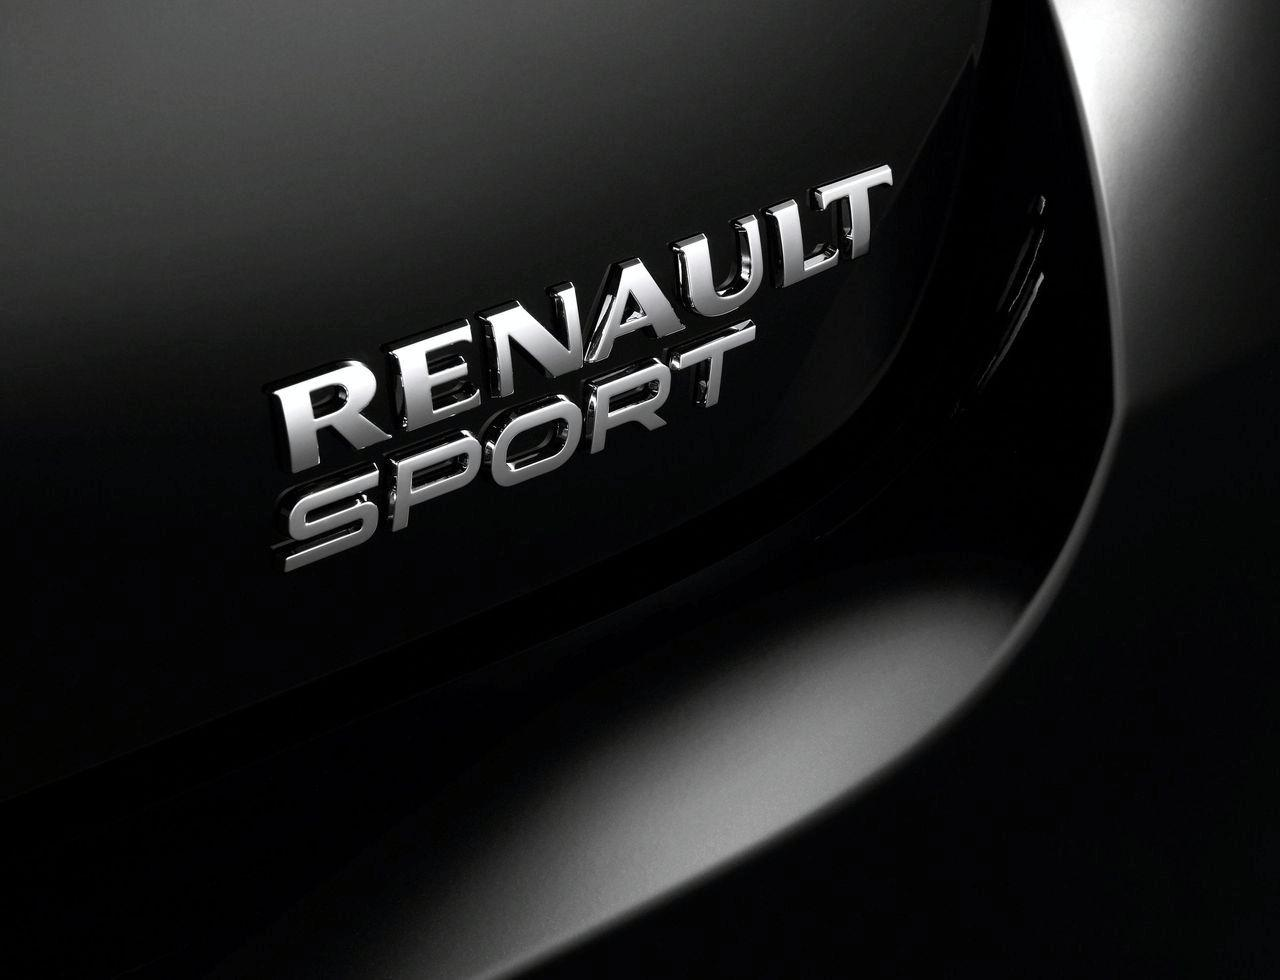 Renault Sport Wallpaper For Iphone: Renault Logo Wallpapers